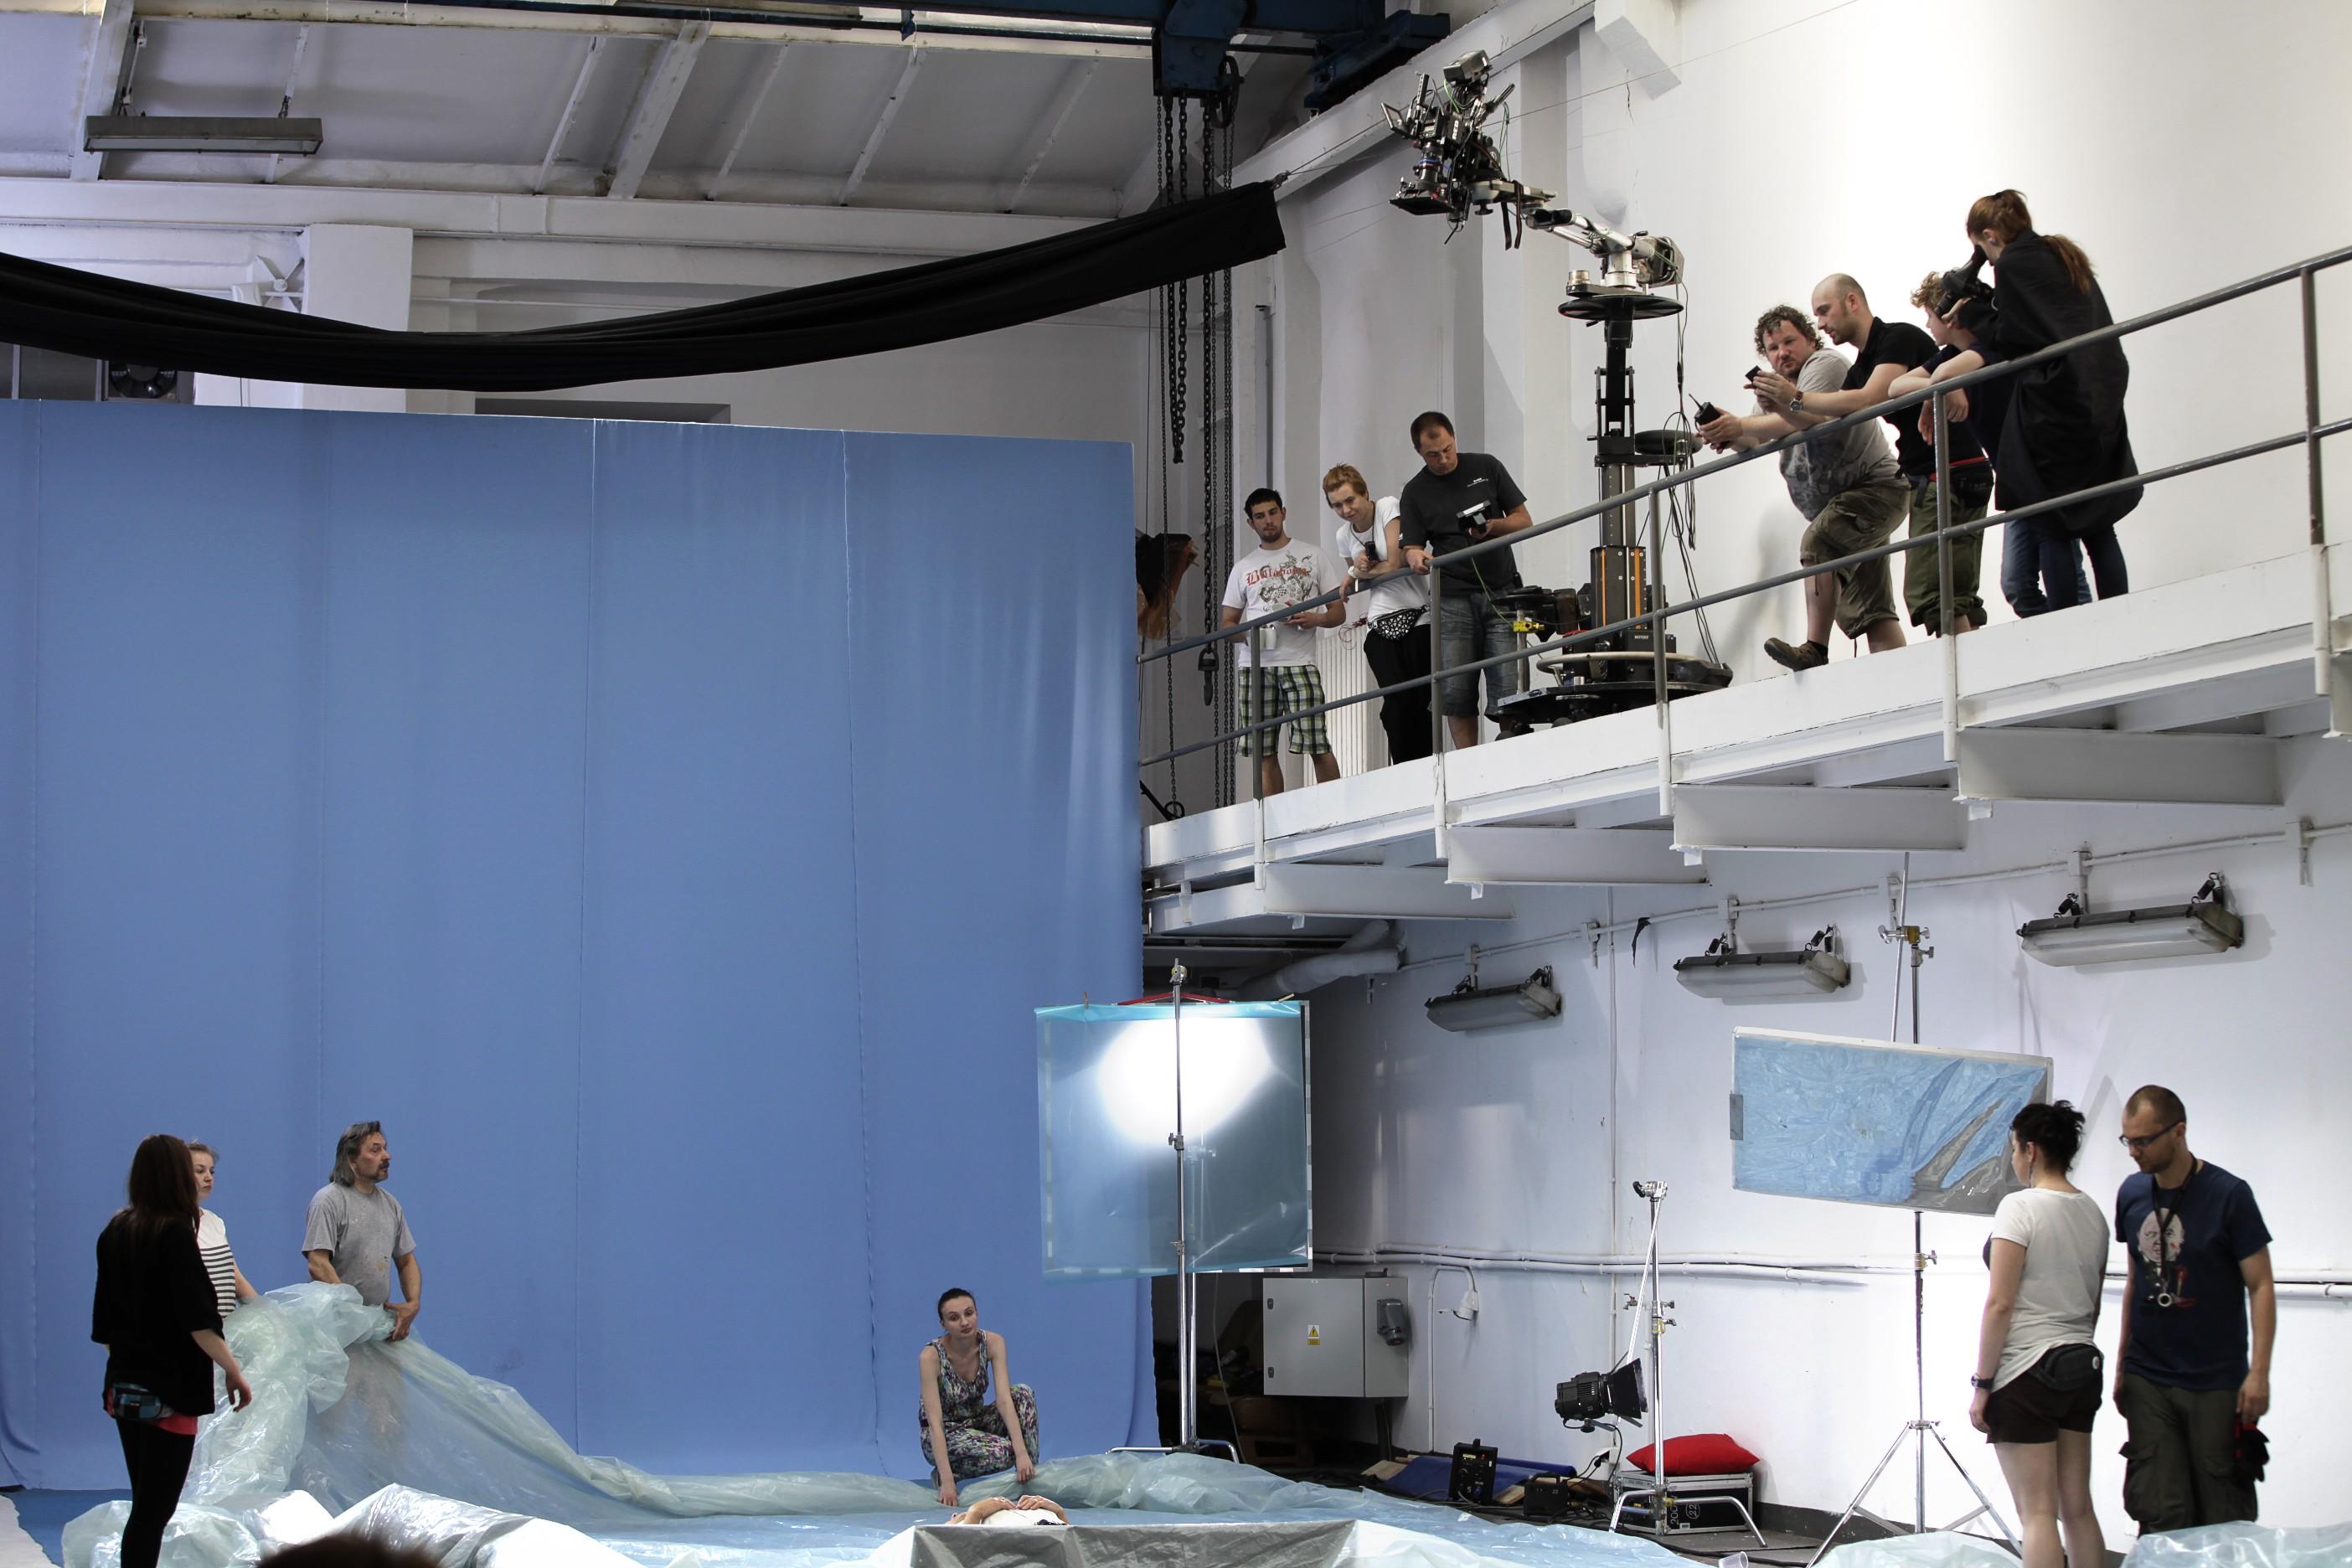 Plan filmu - jak gleboki jest ocean - rezyseria Filip Syczynski - maj 2012